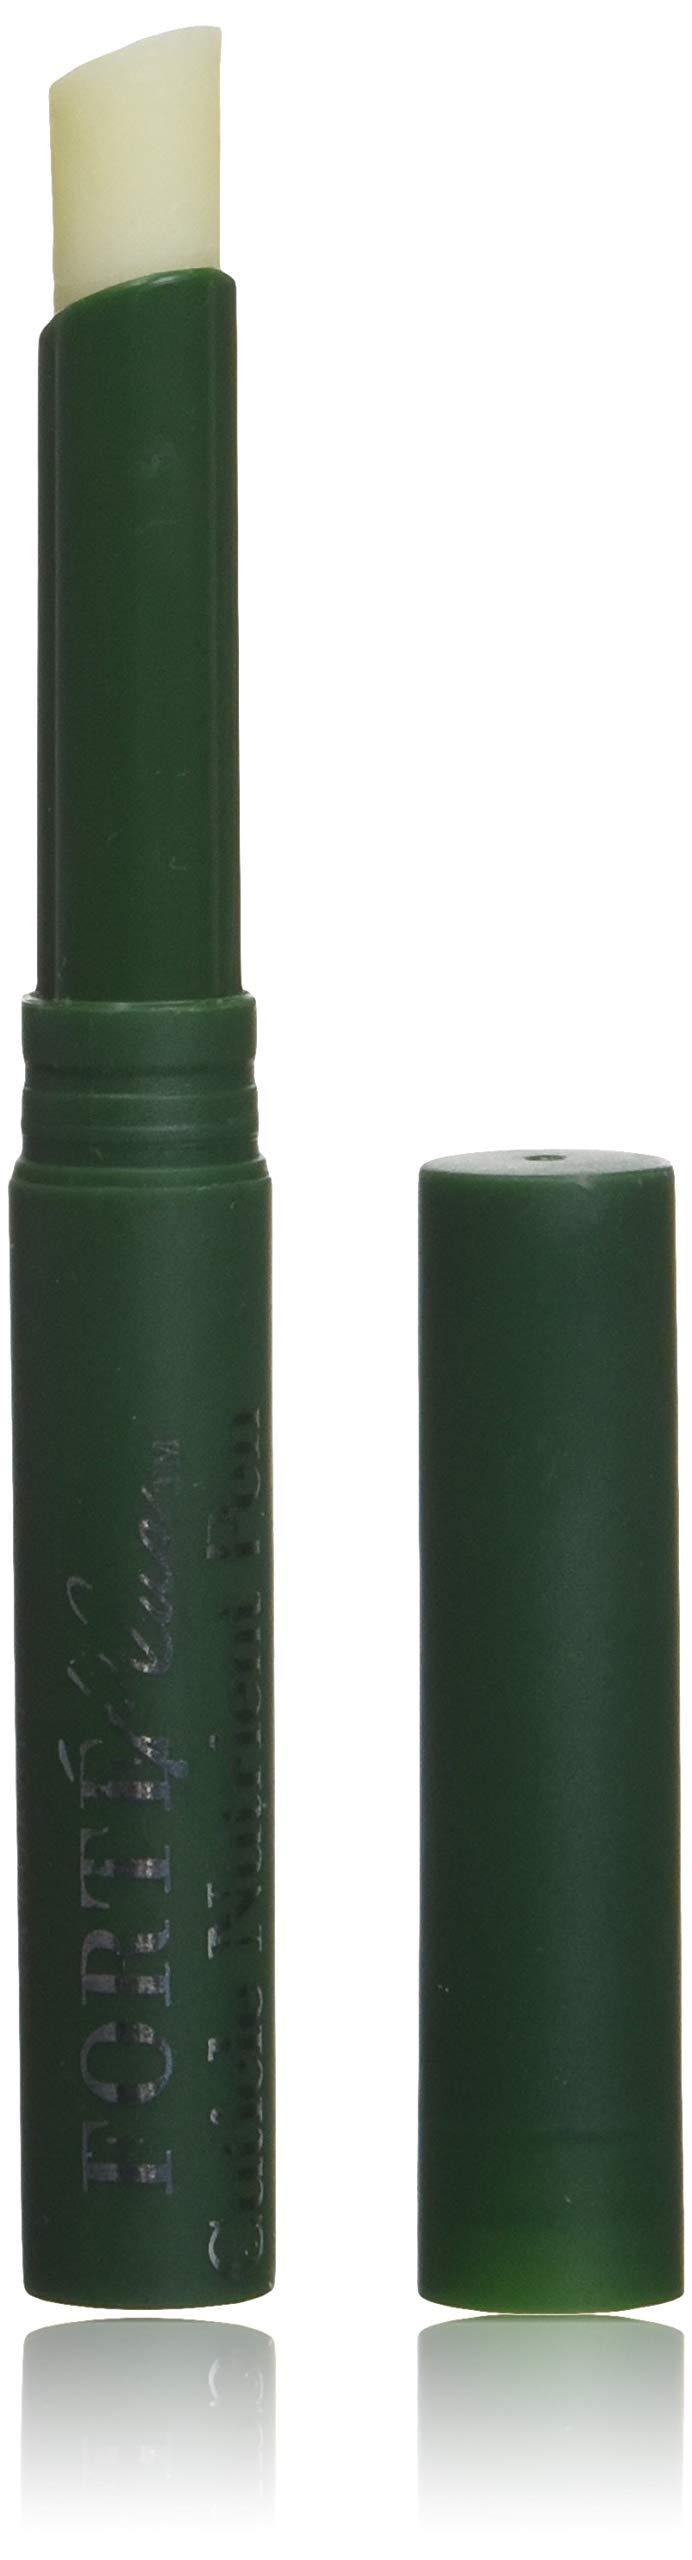 Cuccio Naturale Forte Plus Cuticle Nutrient Pen, 1.6 g by Cuccio